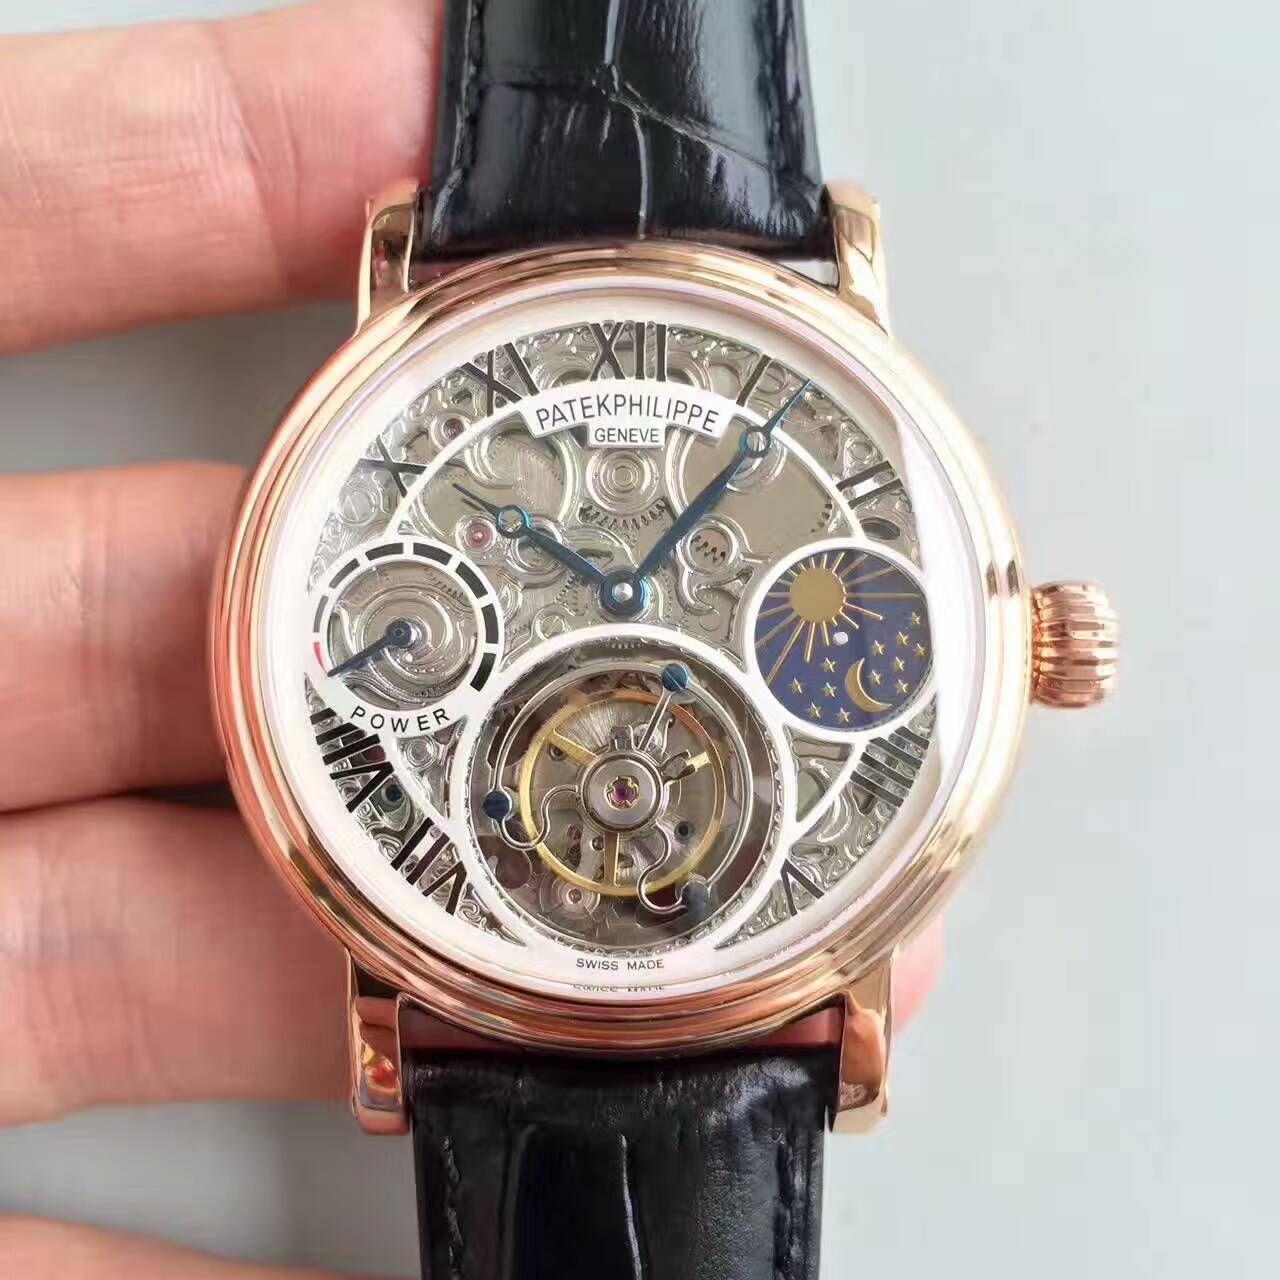 【TF厂一比一精仿手表】百达翡丽镂空雕花动力星辰真陀飞轮腕表